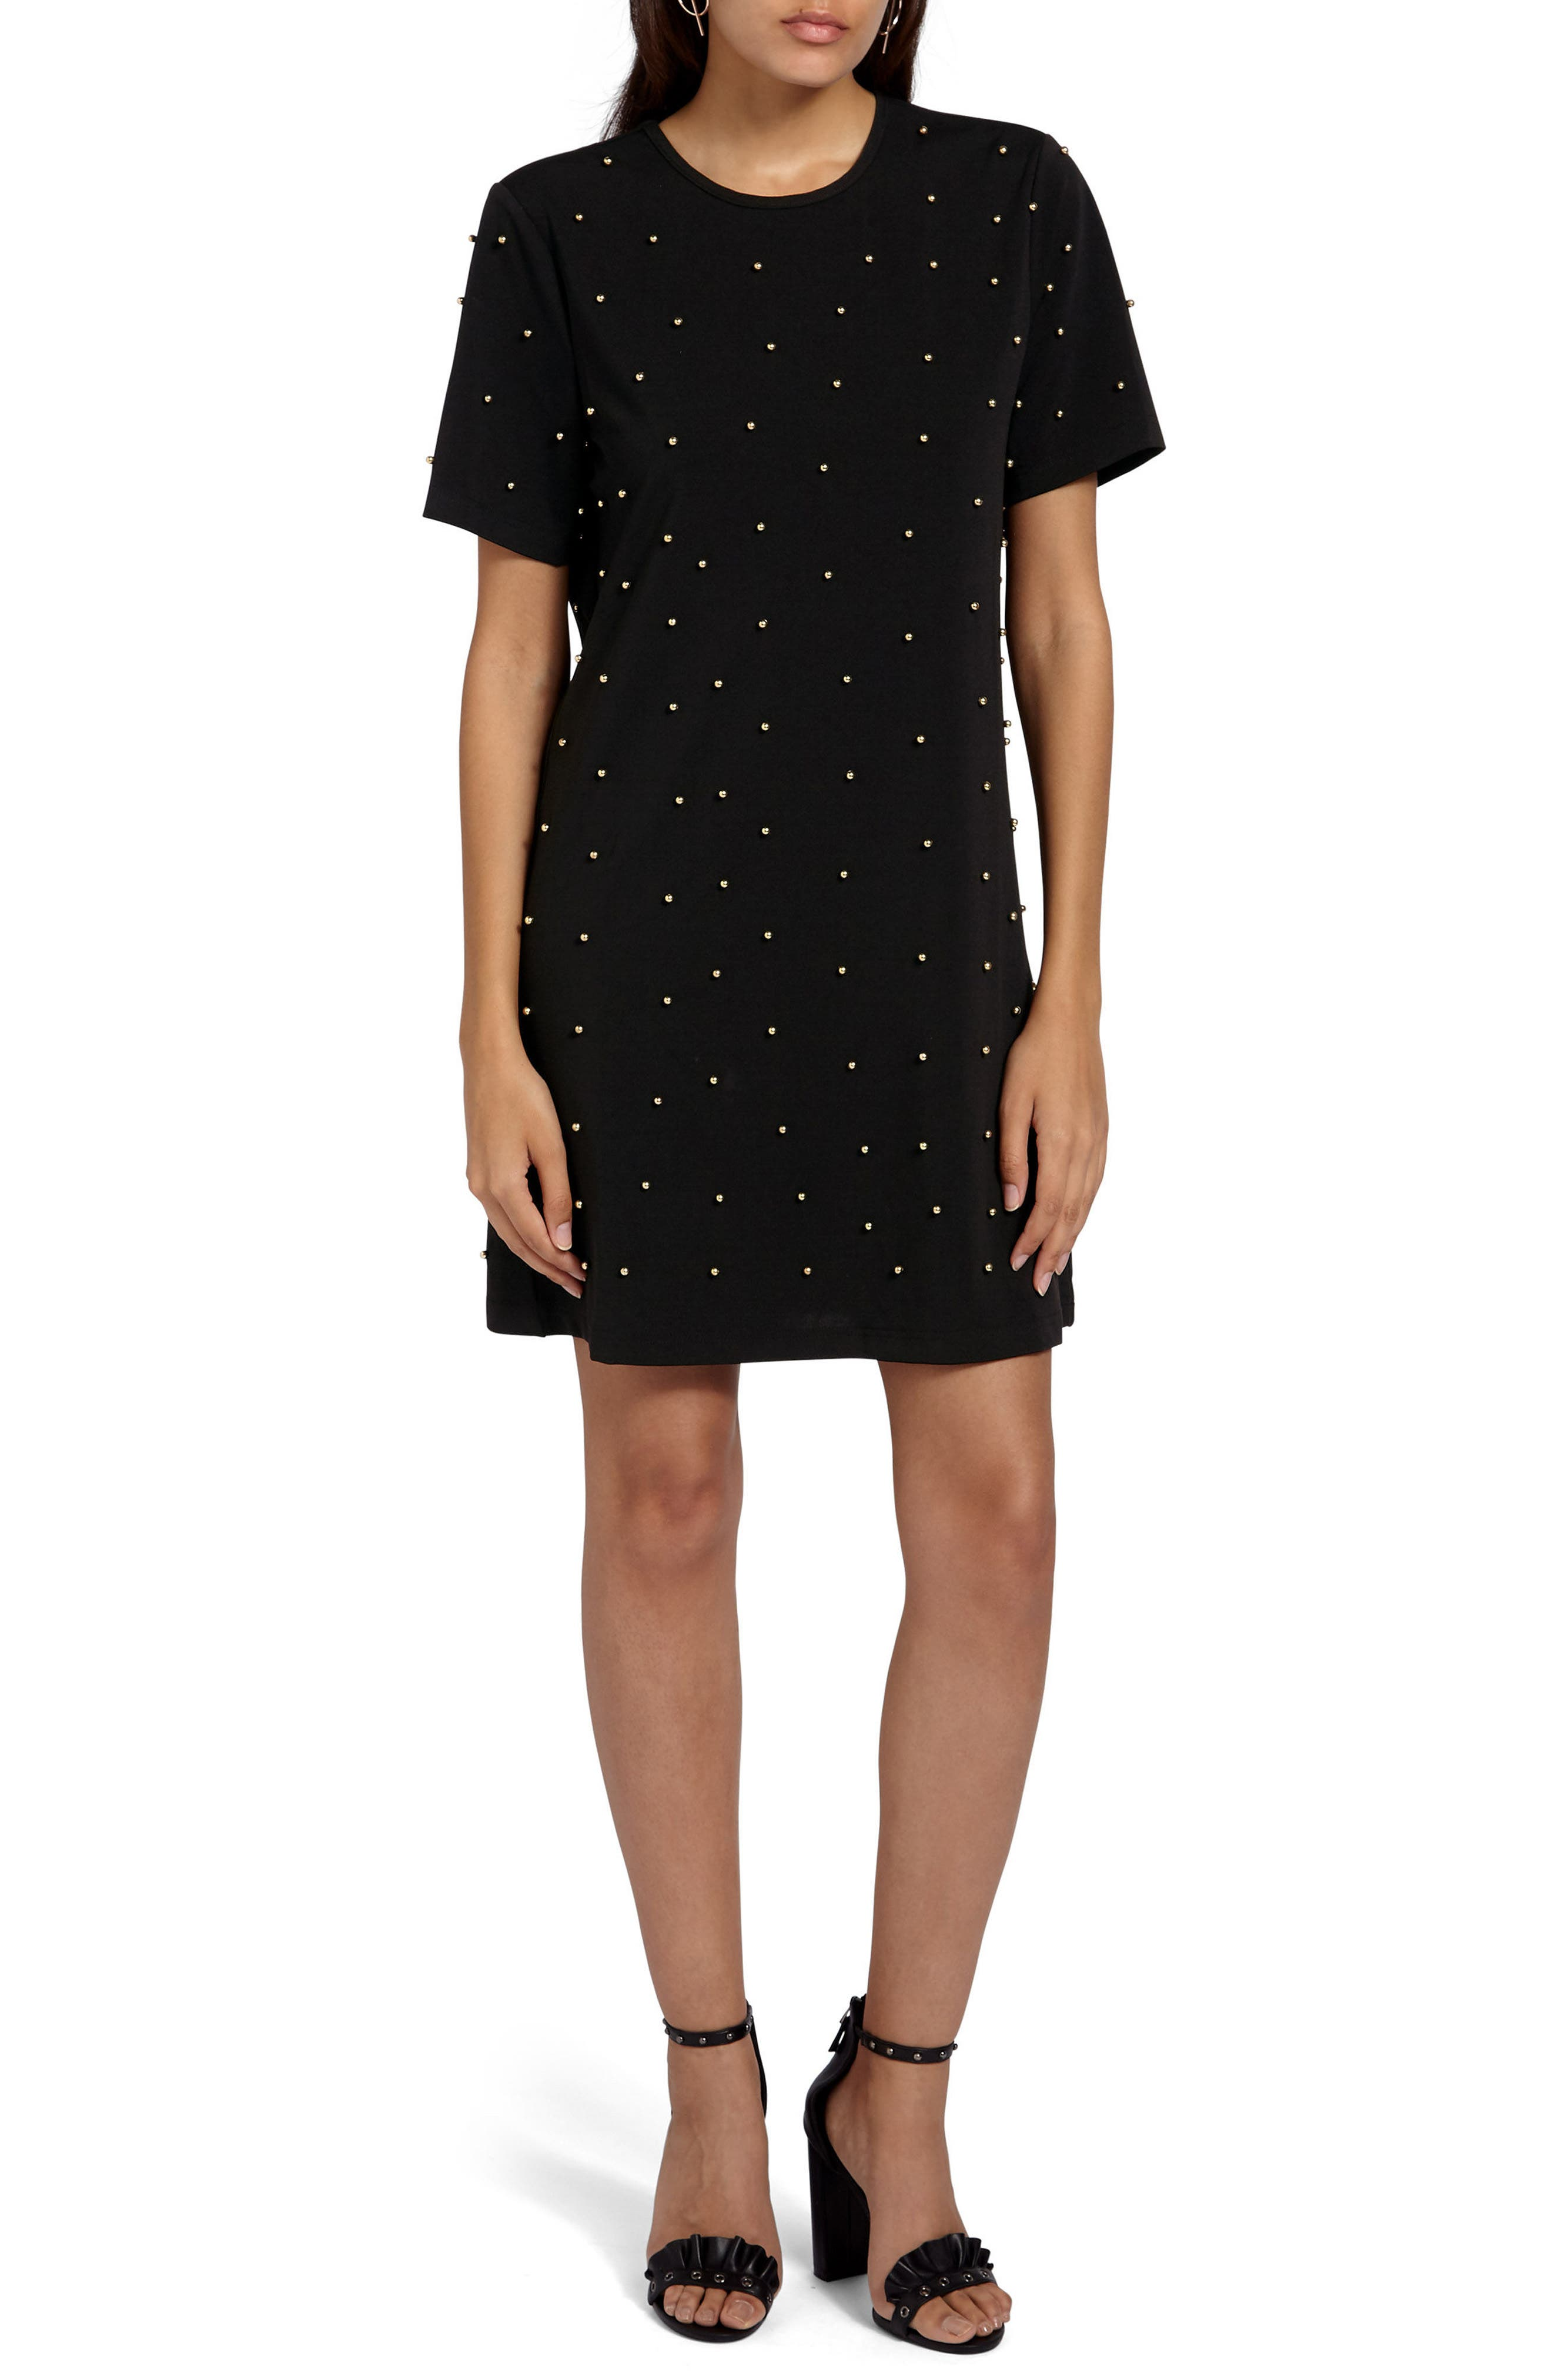 Alternate Image 1 Selected - Missguided Embellished T-Shirt Dress